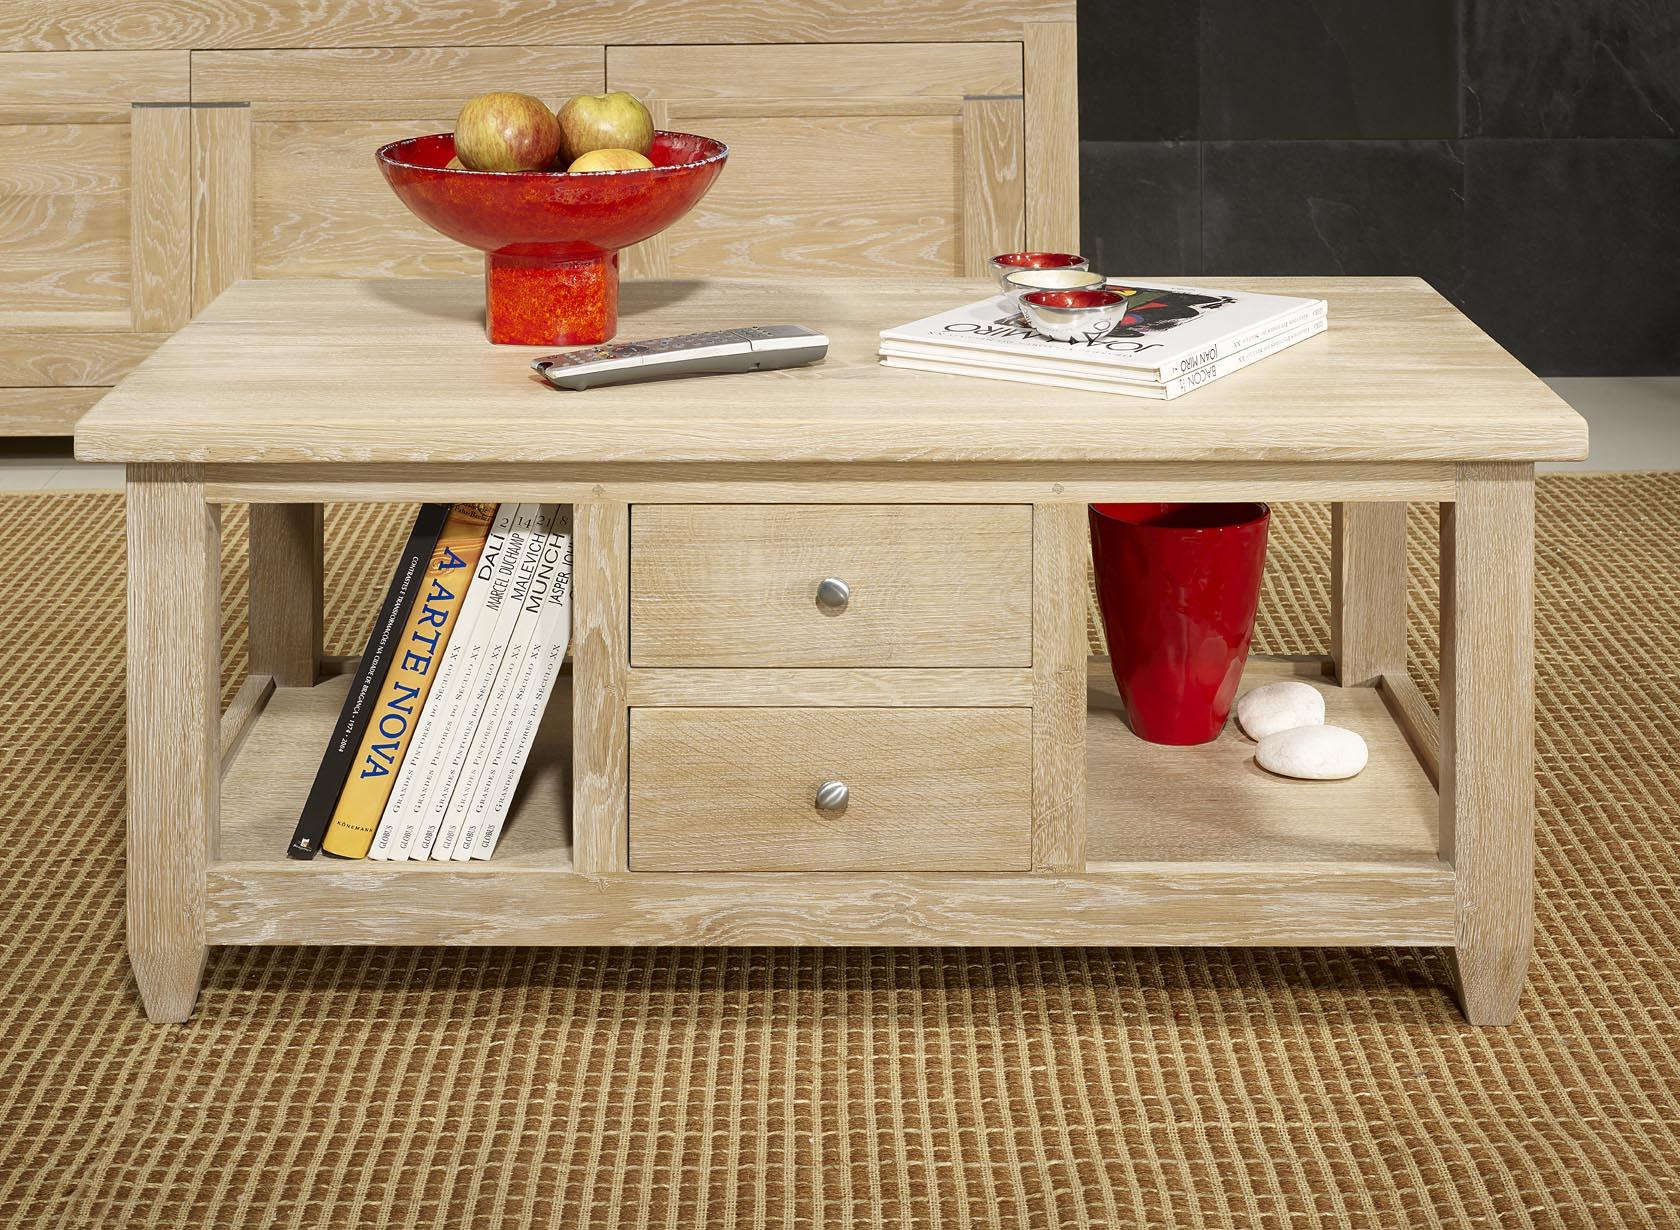 meuble en ch ne table basse thomas r alis e en ch ne massif de style campagnard finition ch ne. Black Bedroom Furniture Sets. Home Design Ideas